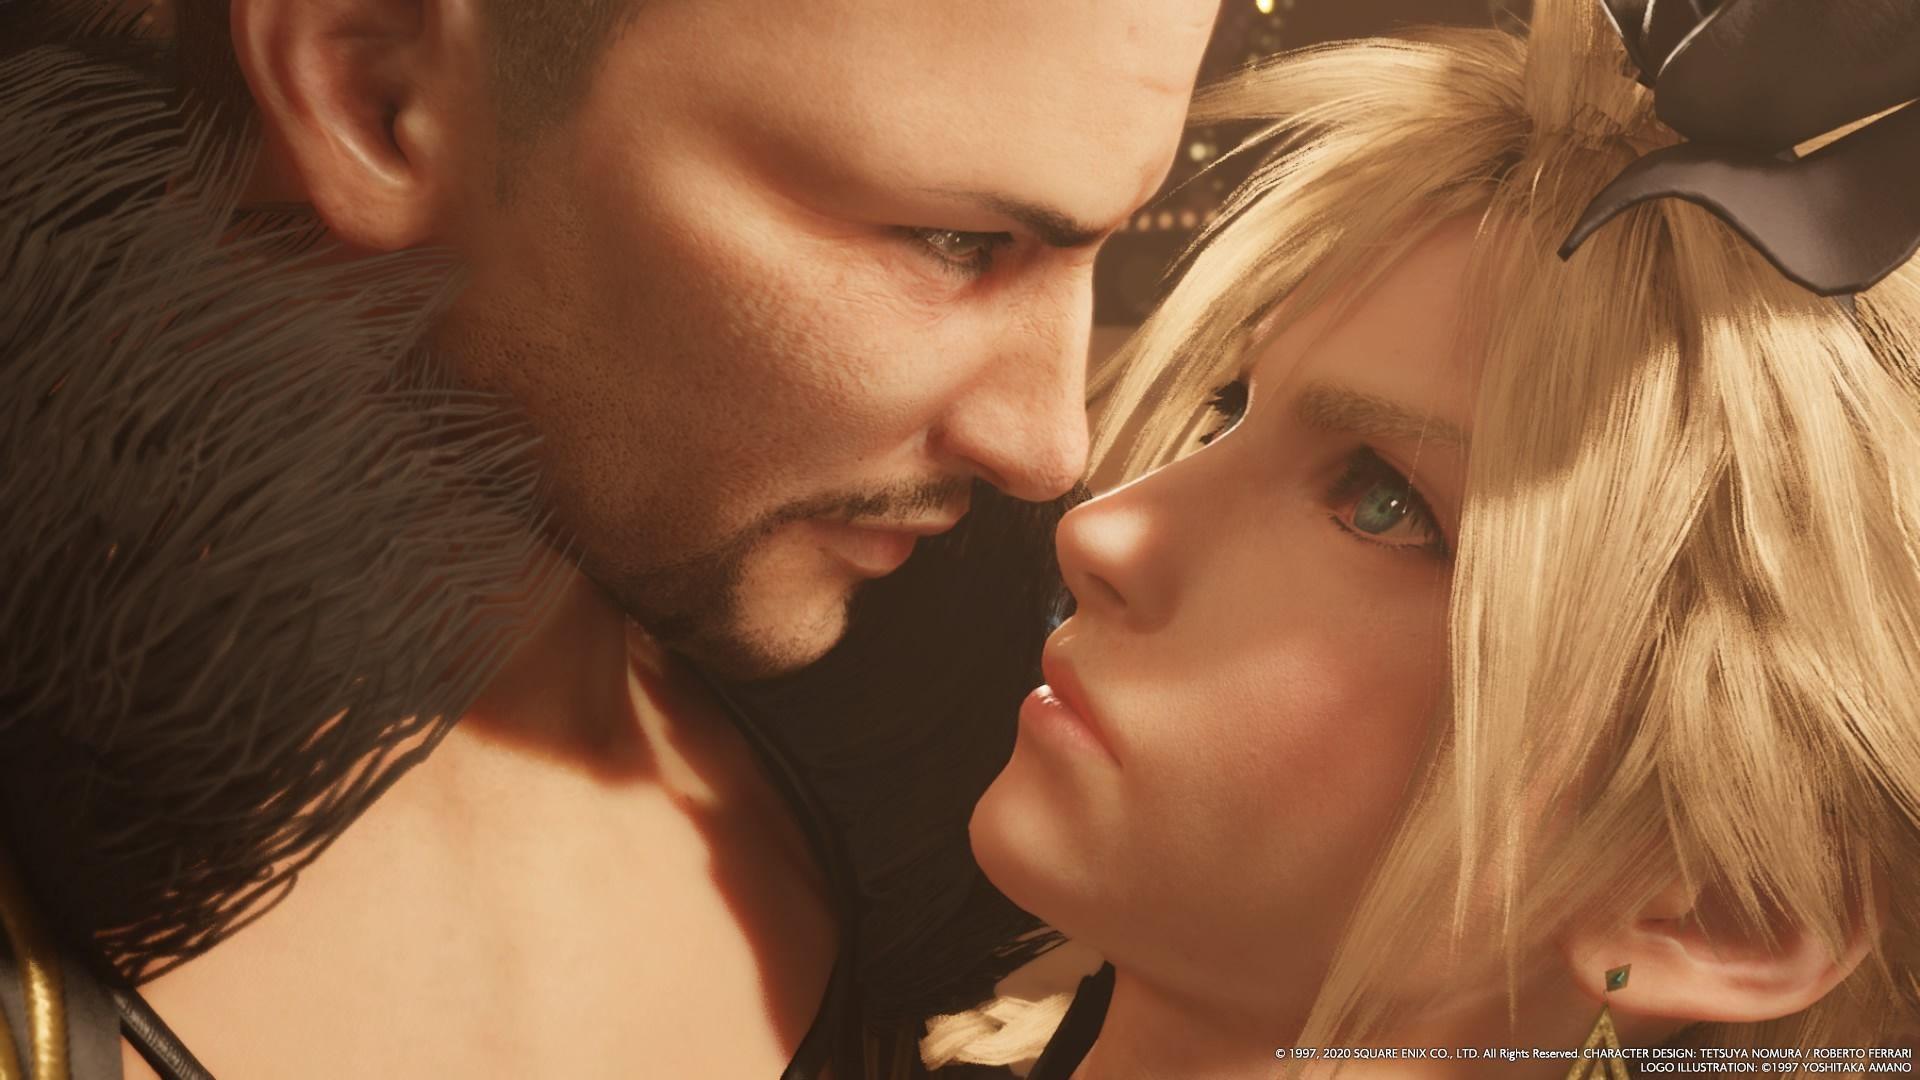 Final Fantasy VII: Remake Screenshot